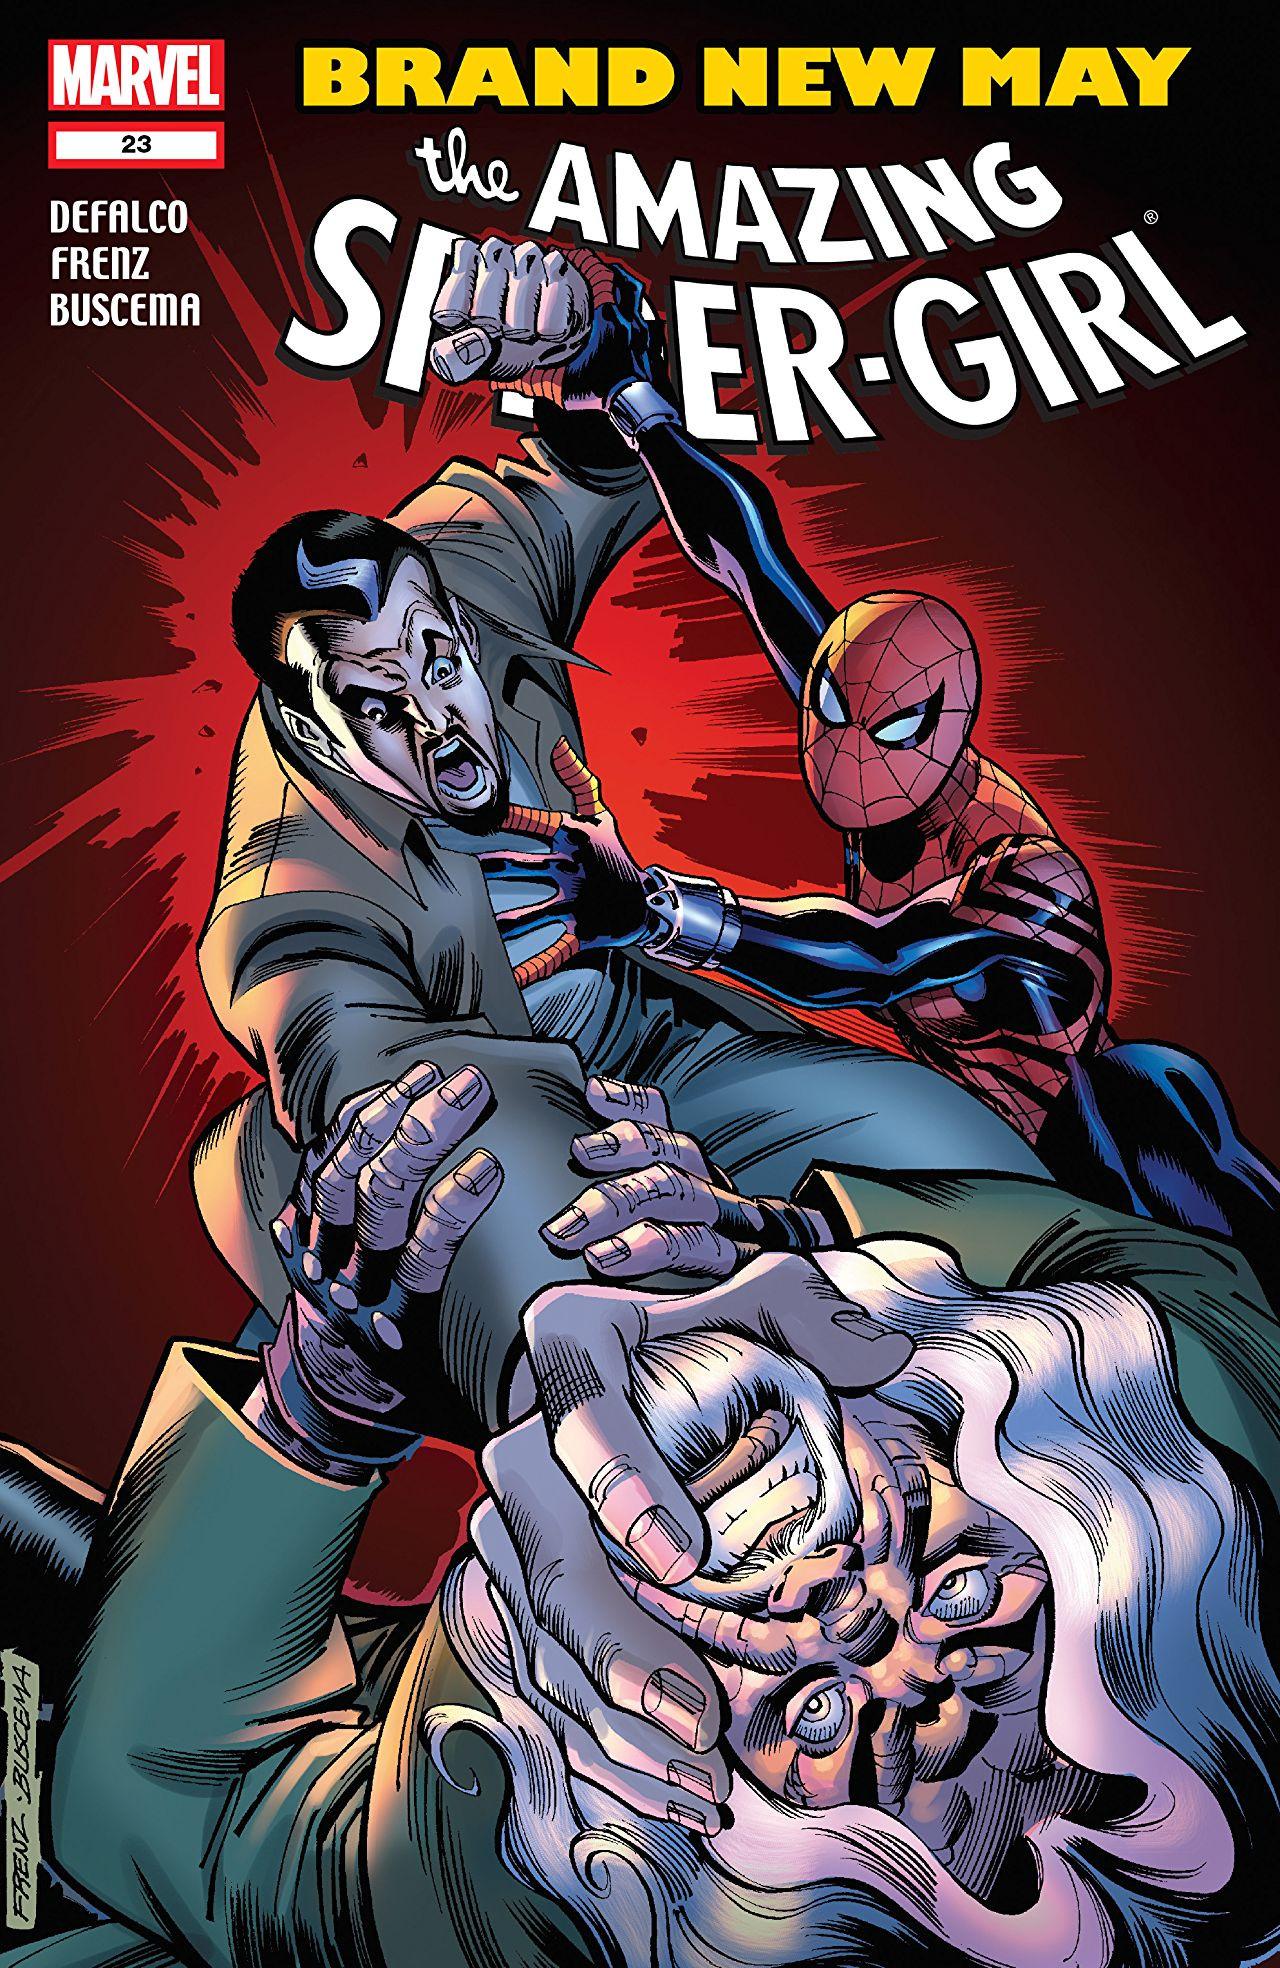 Amazing Spider-Girl Vol 1 23